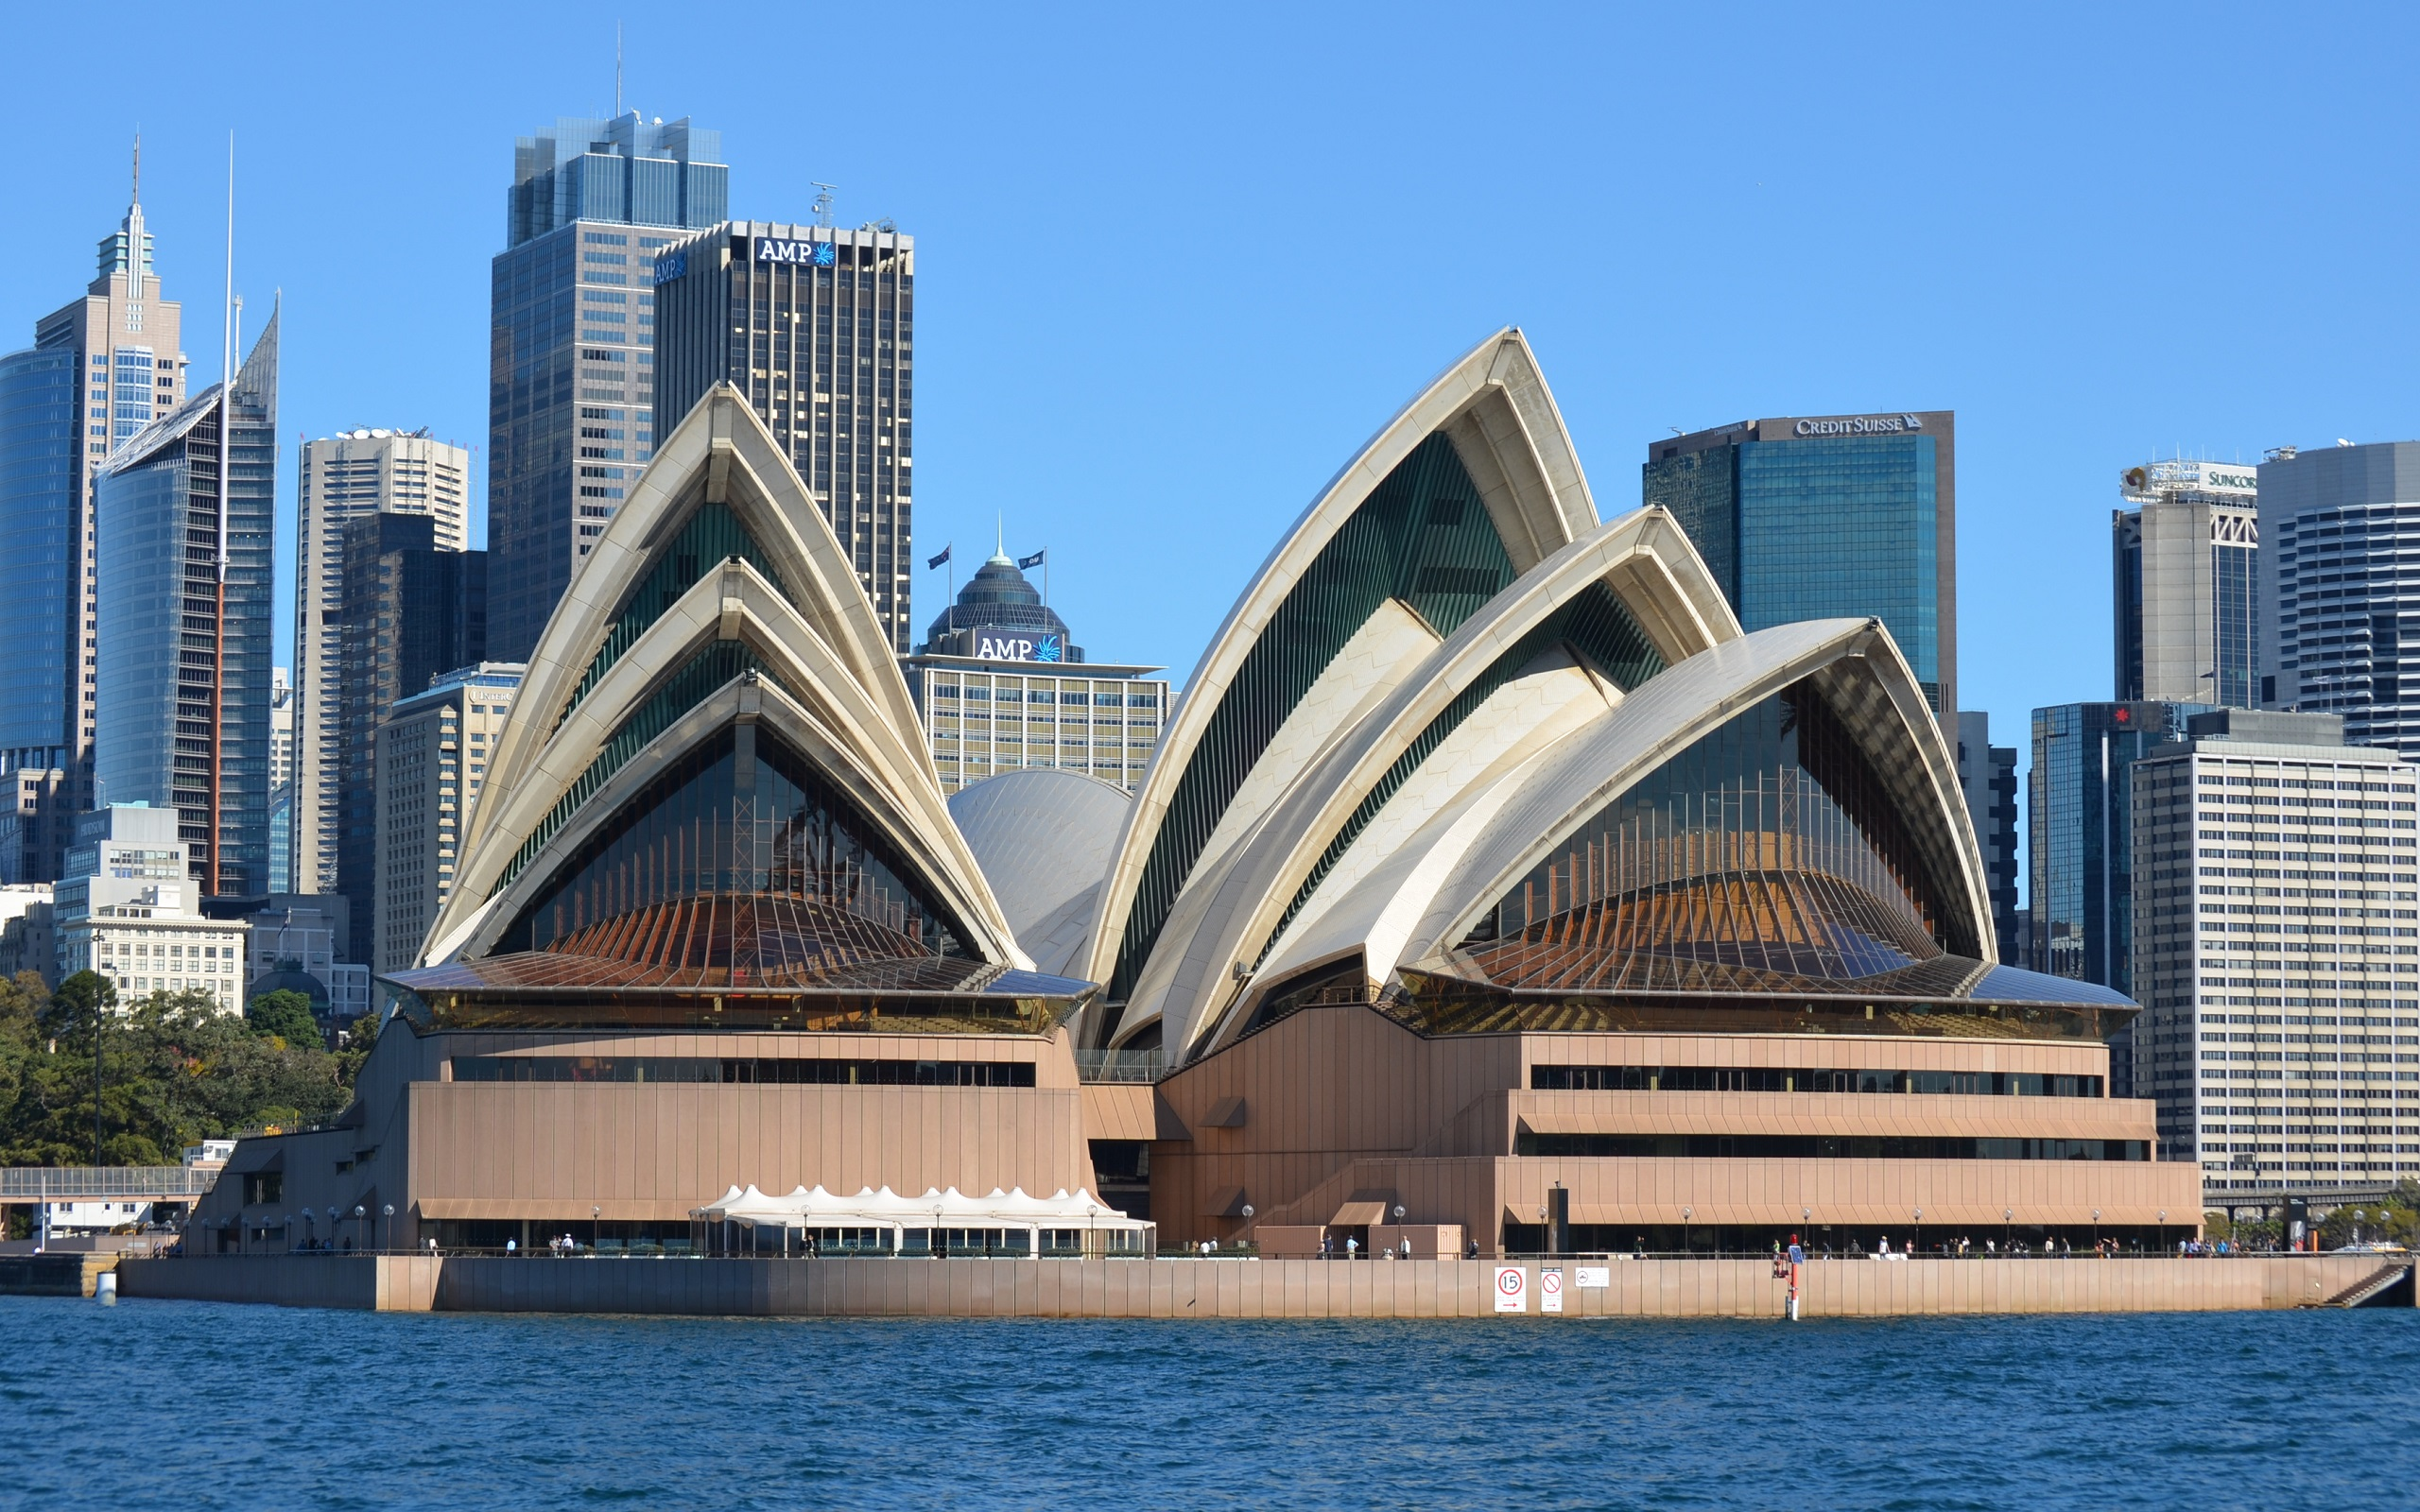 Sydney Opera house Australia Computer Wallpapers Desktop 2560x1600